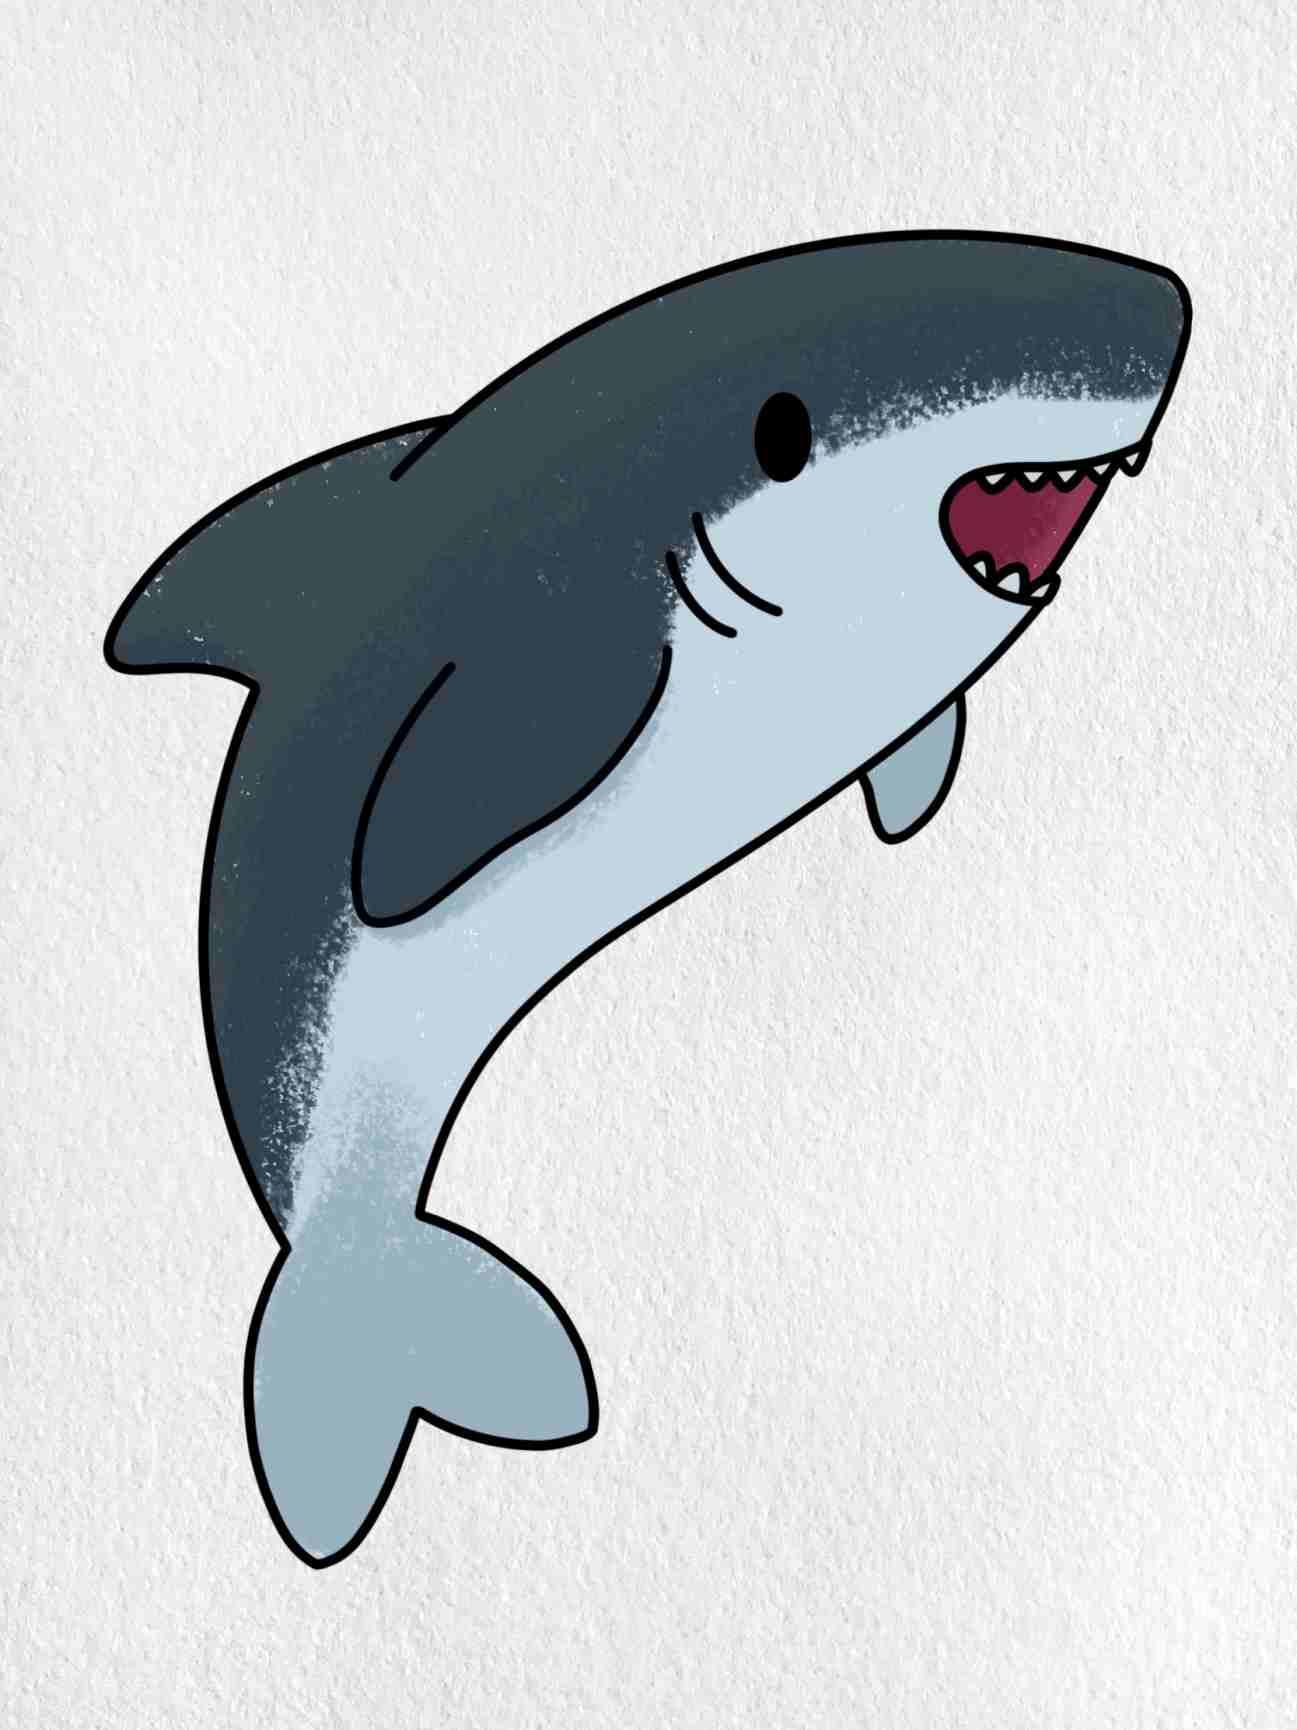 Shark Cartoon Drawing: Step 6